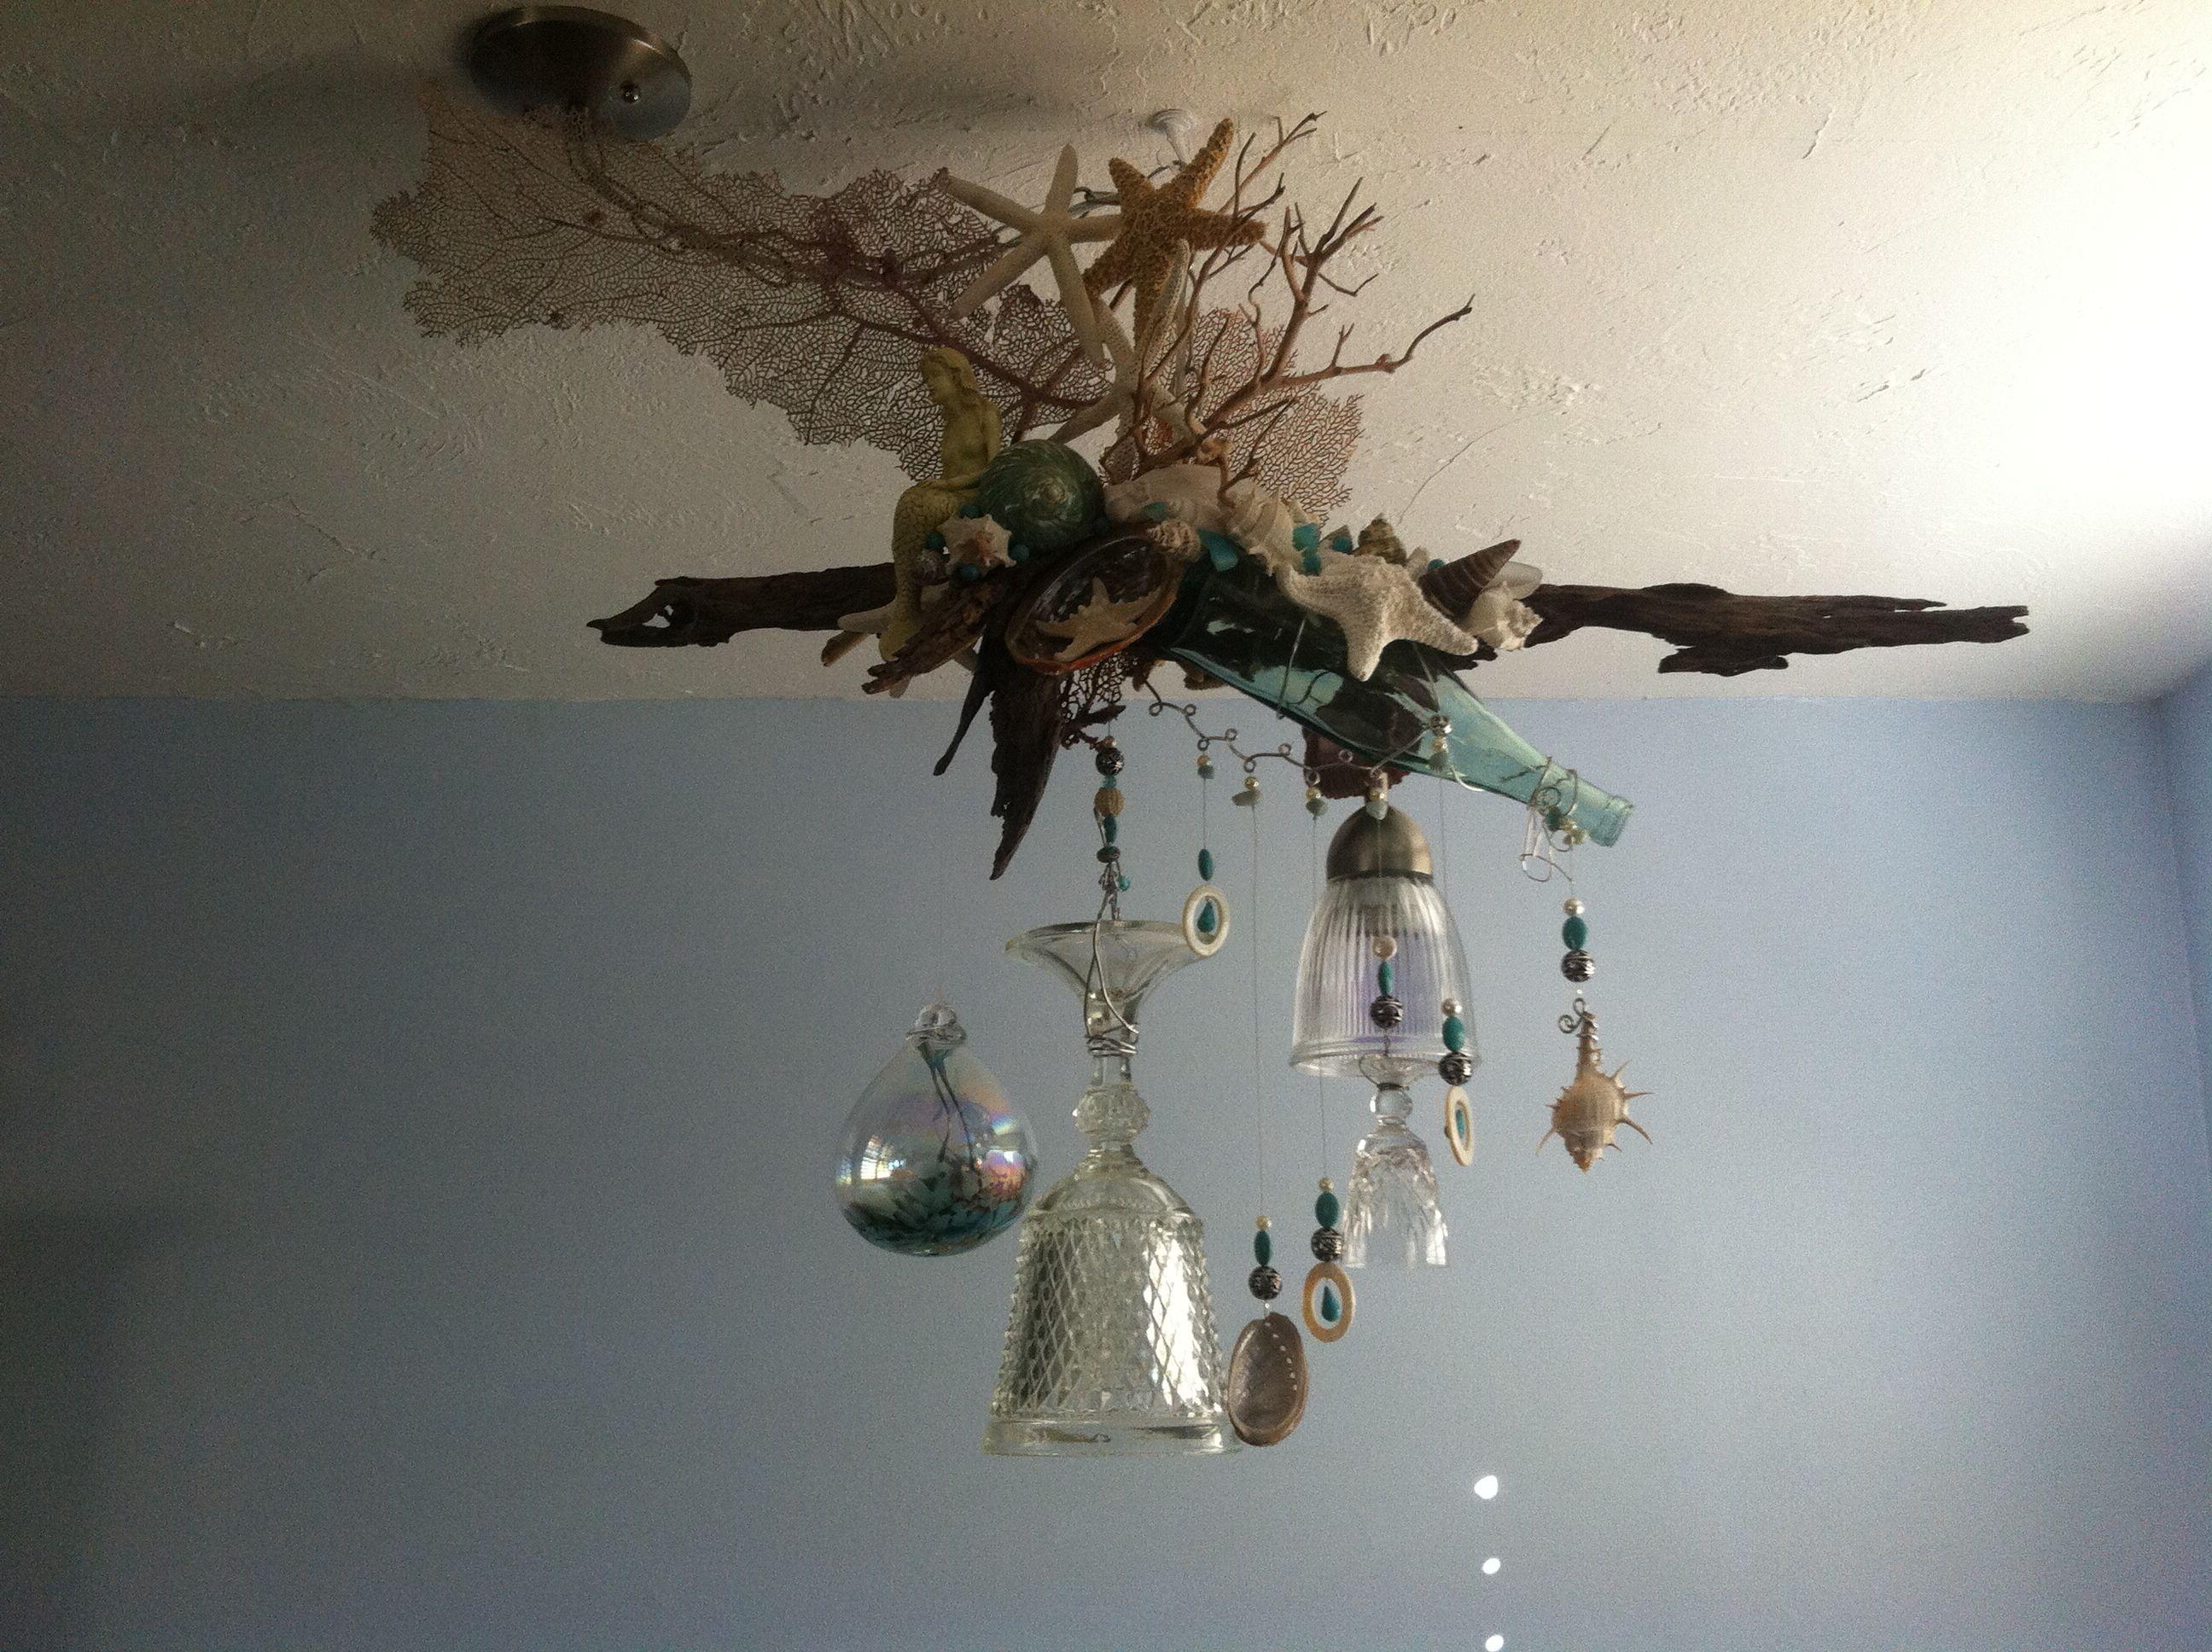 My homemade chandelier my homemade chandelier pinterest my homemade chandelier arubaitofo Gallery